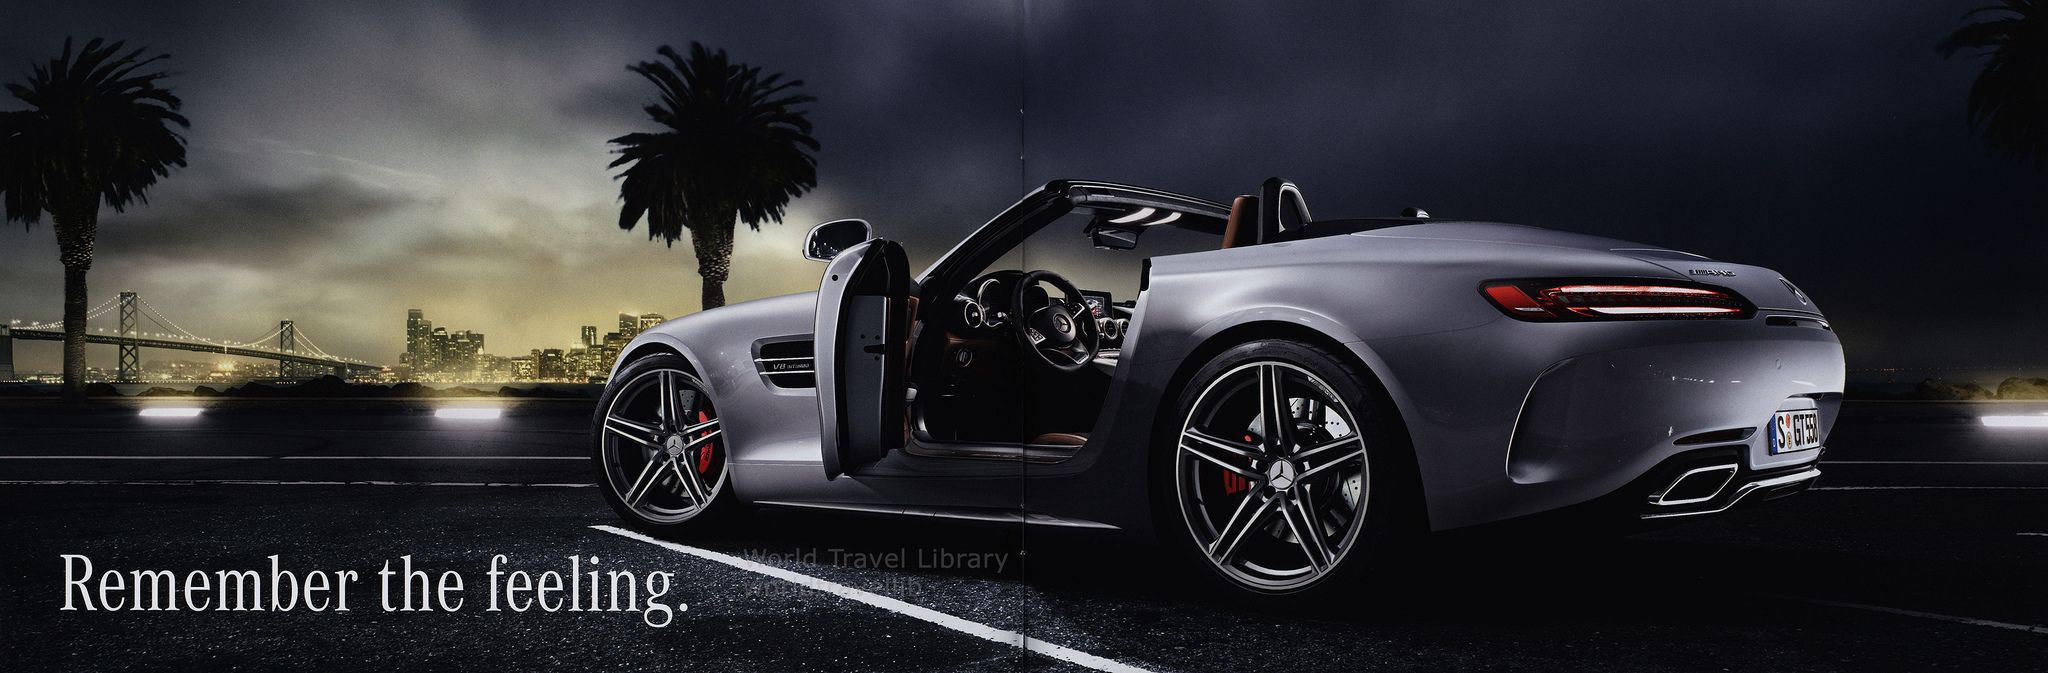 https://flic.kr/p/UXmN3R | Mercedes-Benz AMG GT Roadster;  2016_2